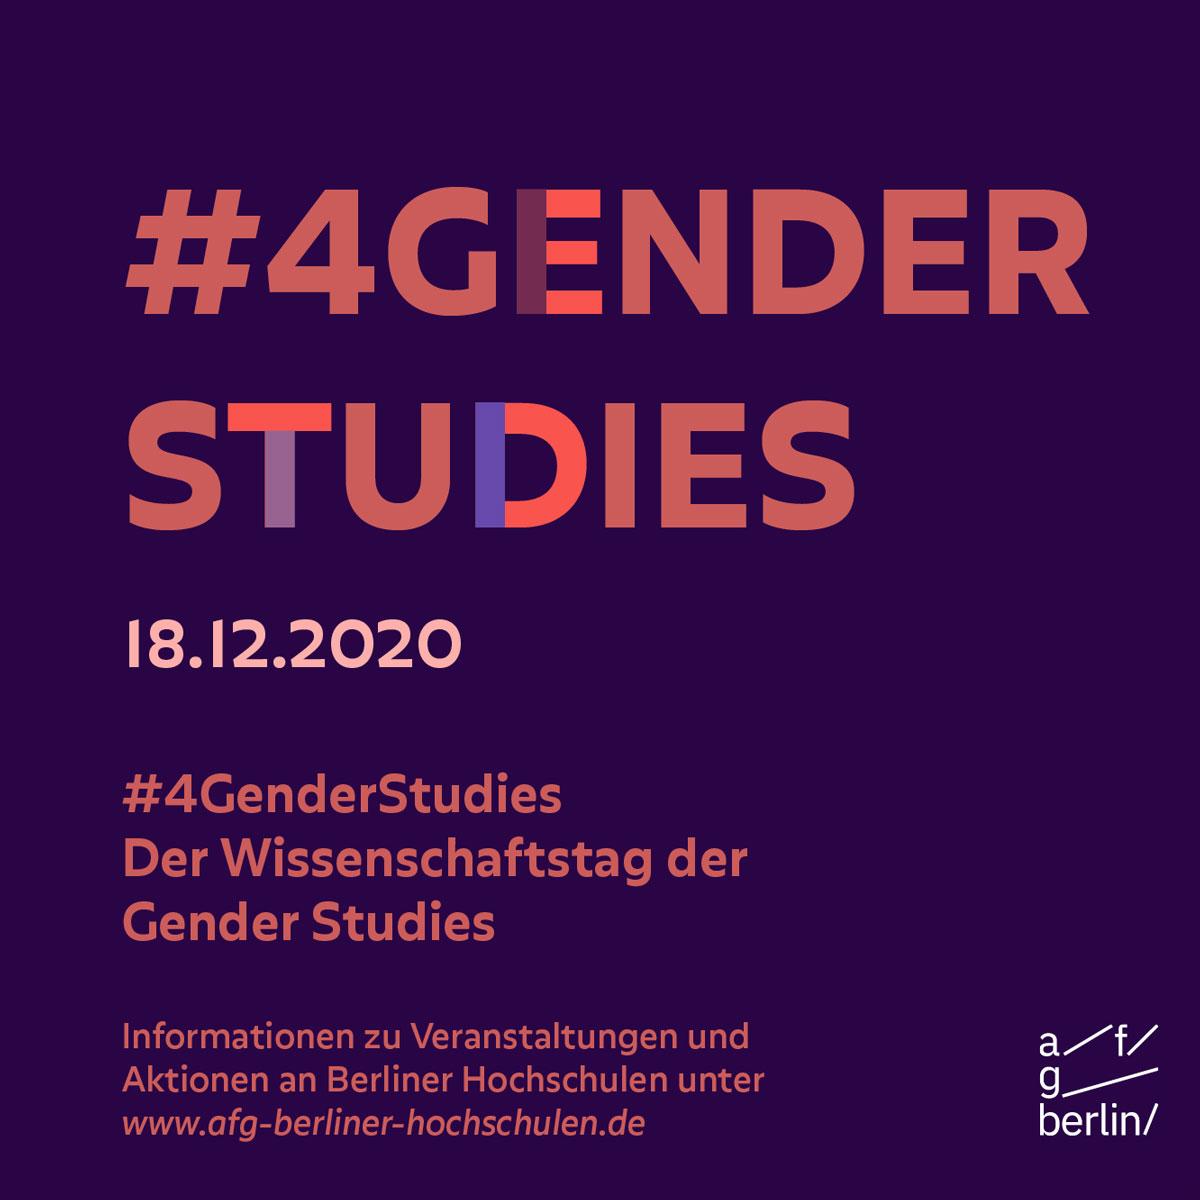 #4GenderStudies 2020